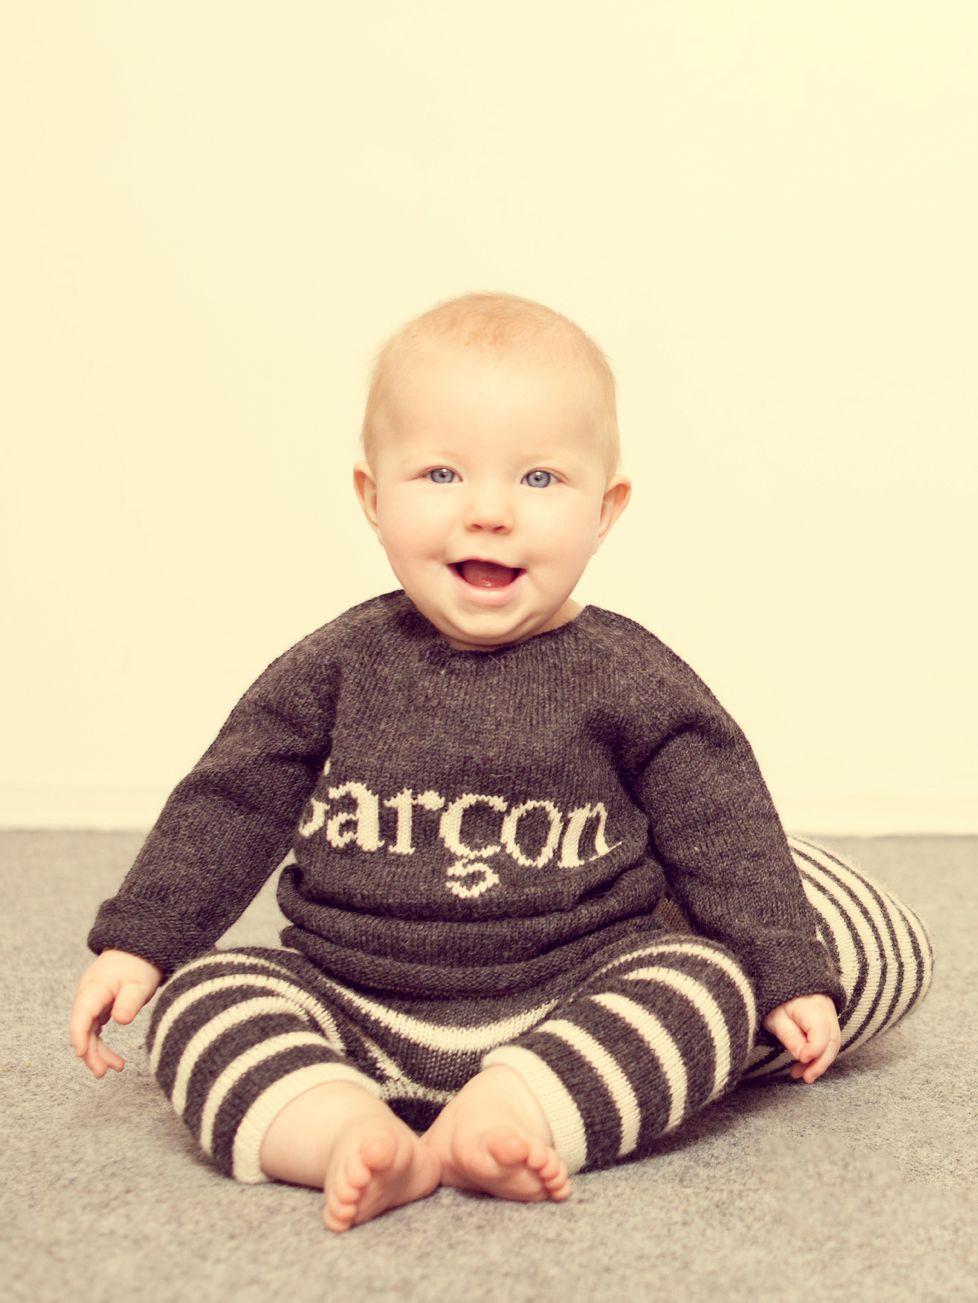 Katrina Tang Photography for Oeuf NYC BABiES AW 14. Happy baby sitting on a floor, laughing #katrinatang #tangkatrina